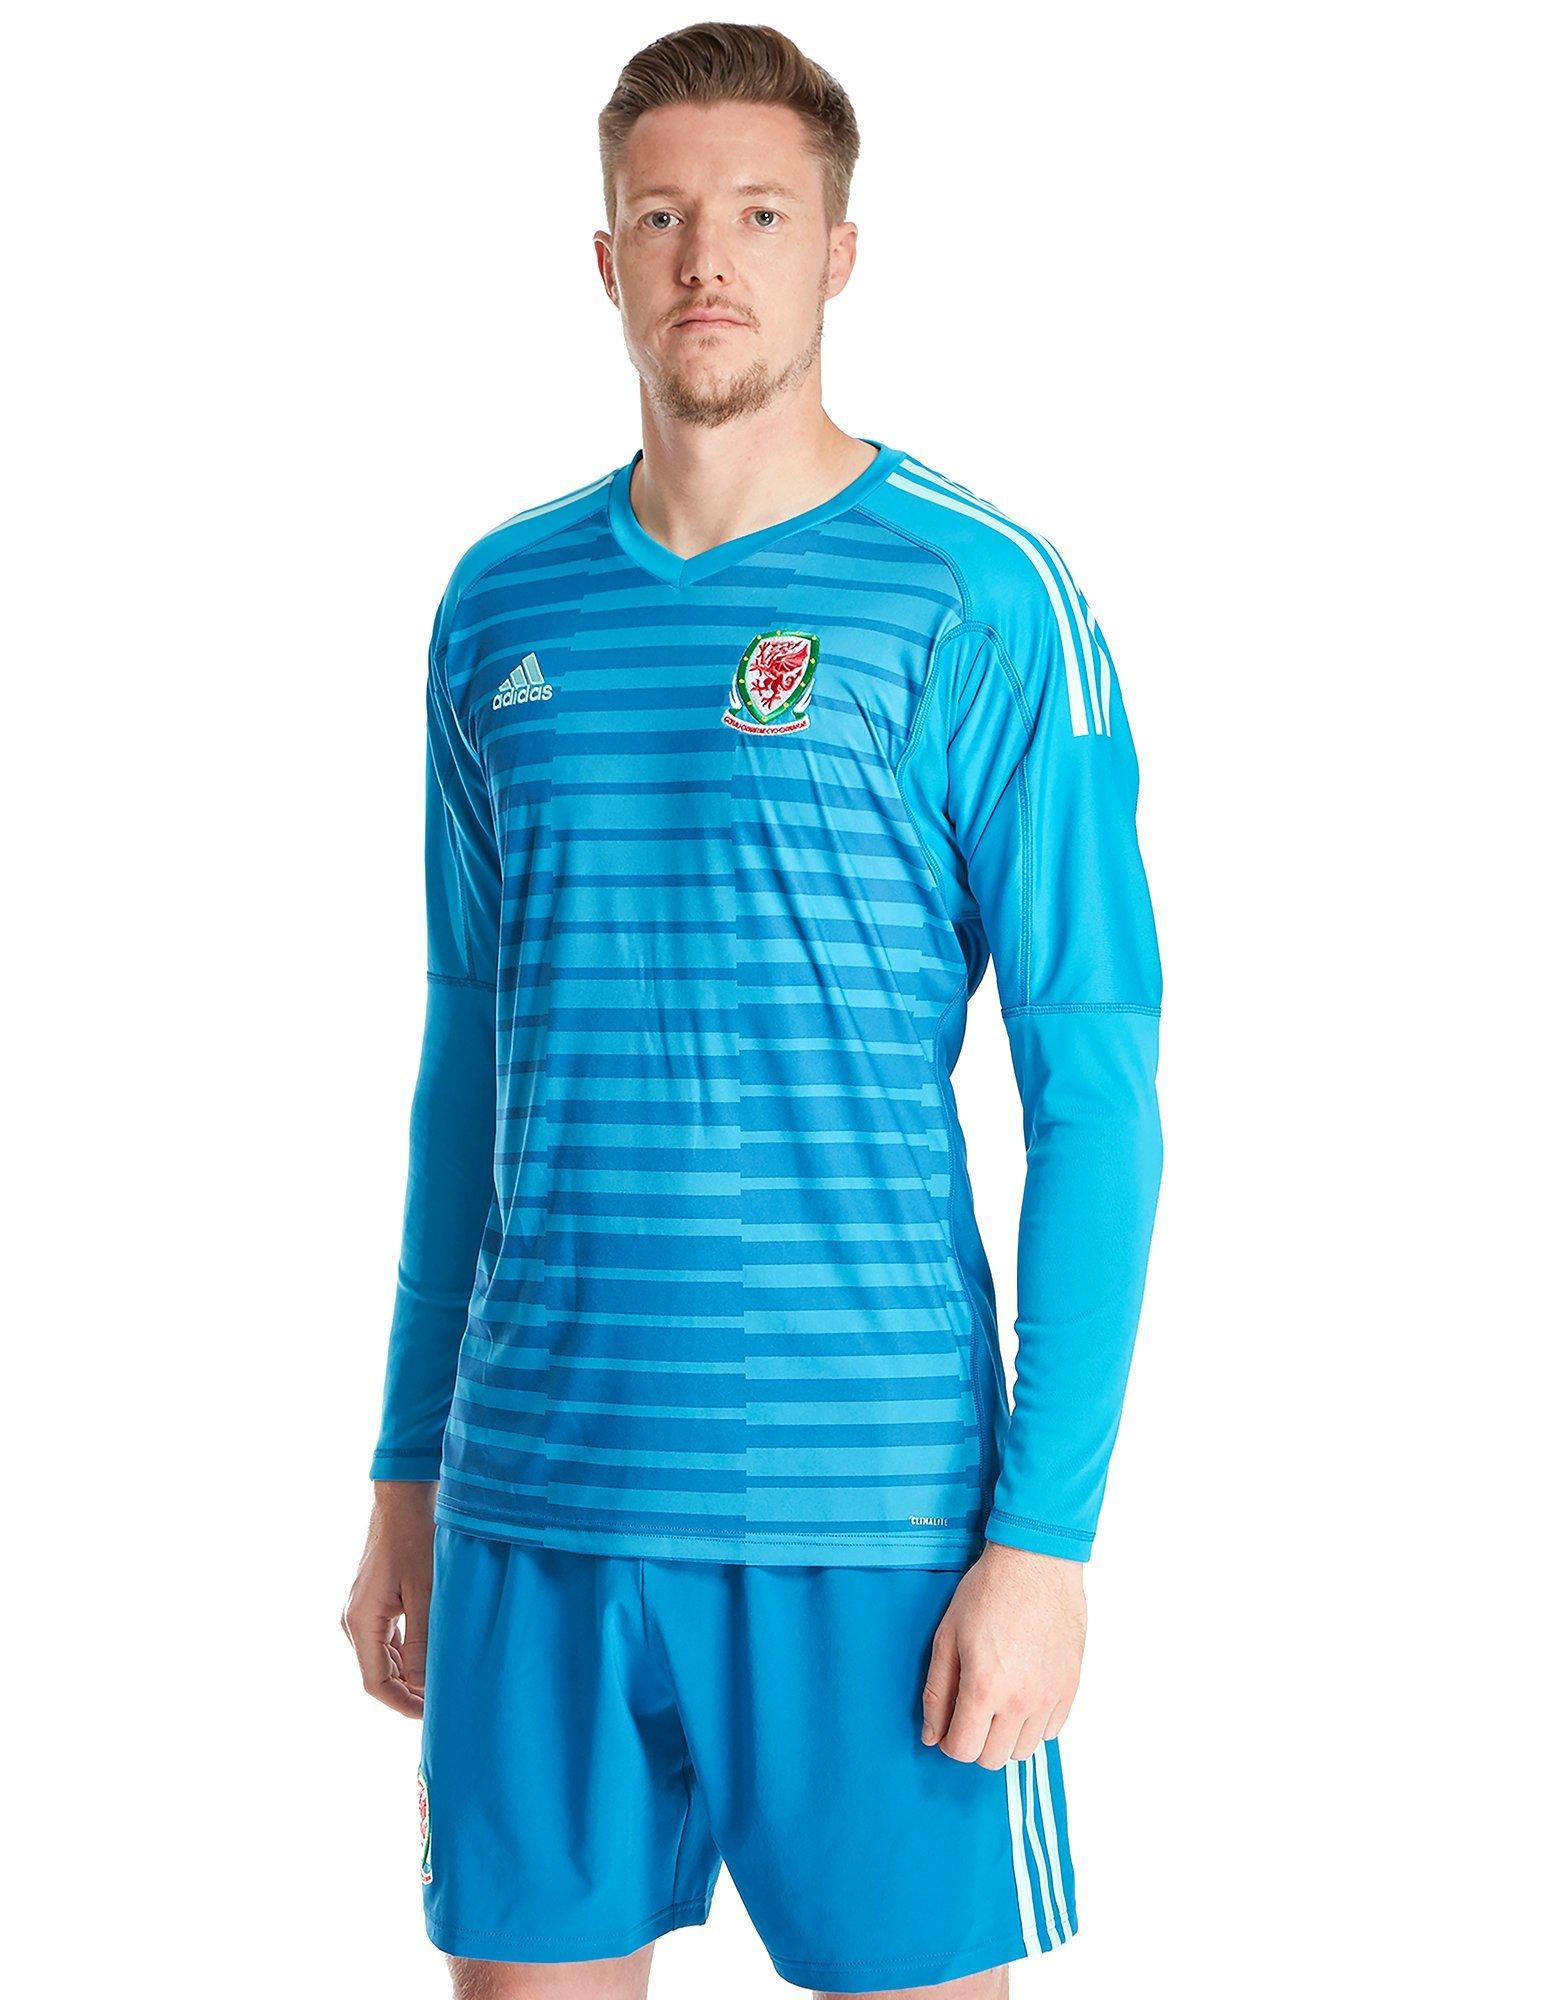 adidas Wales 2018/19 Home Goalkeeper Shirt